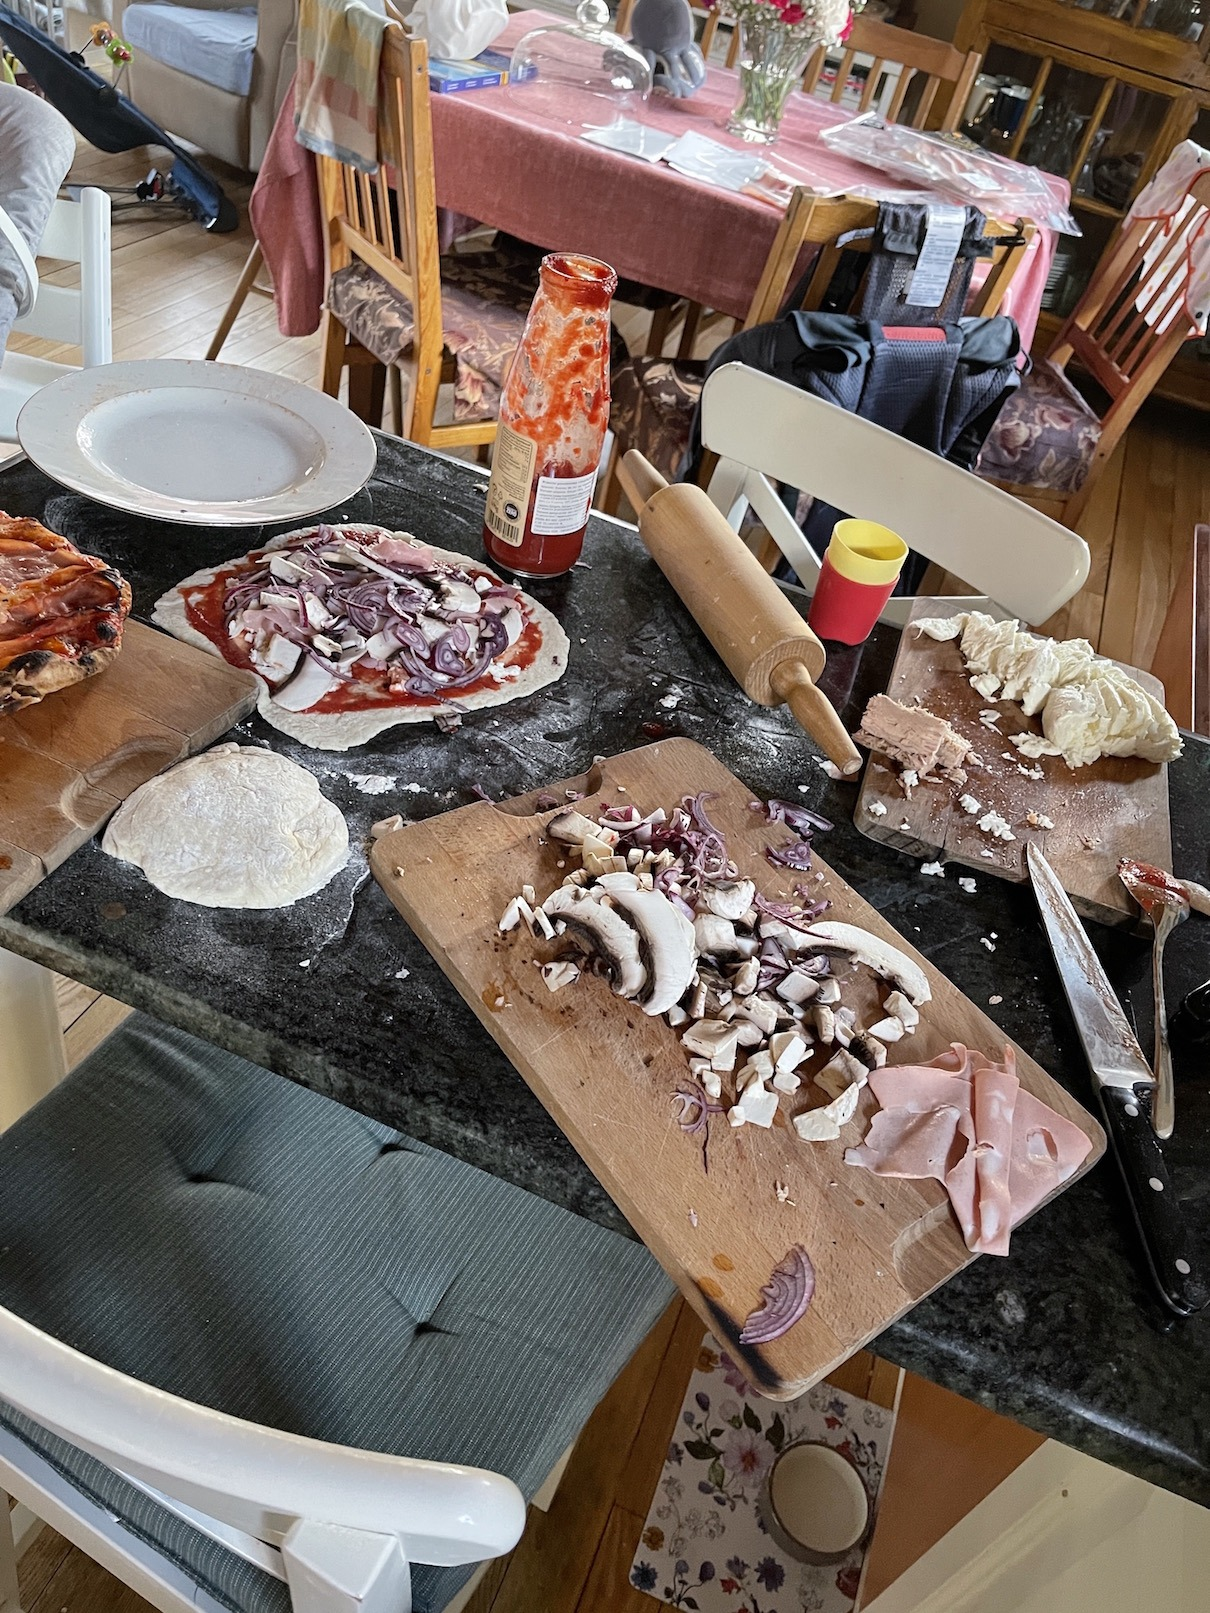 Ula Pedantula bałagan w kuchni